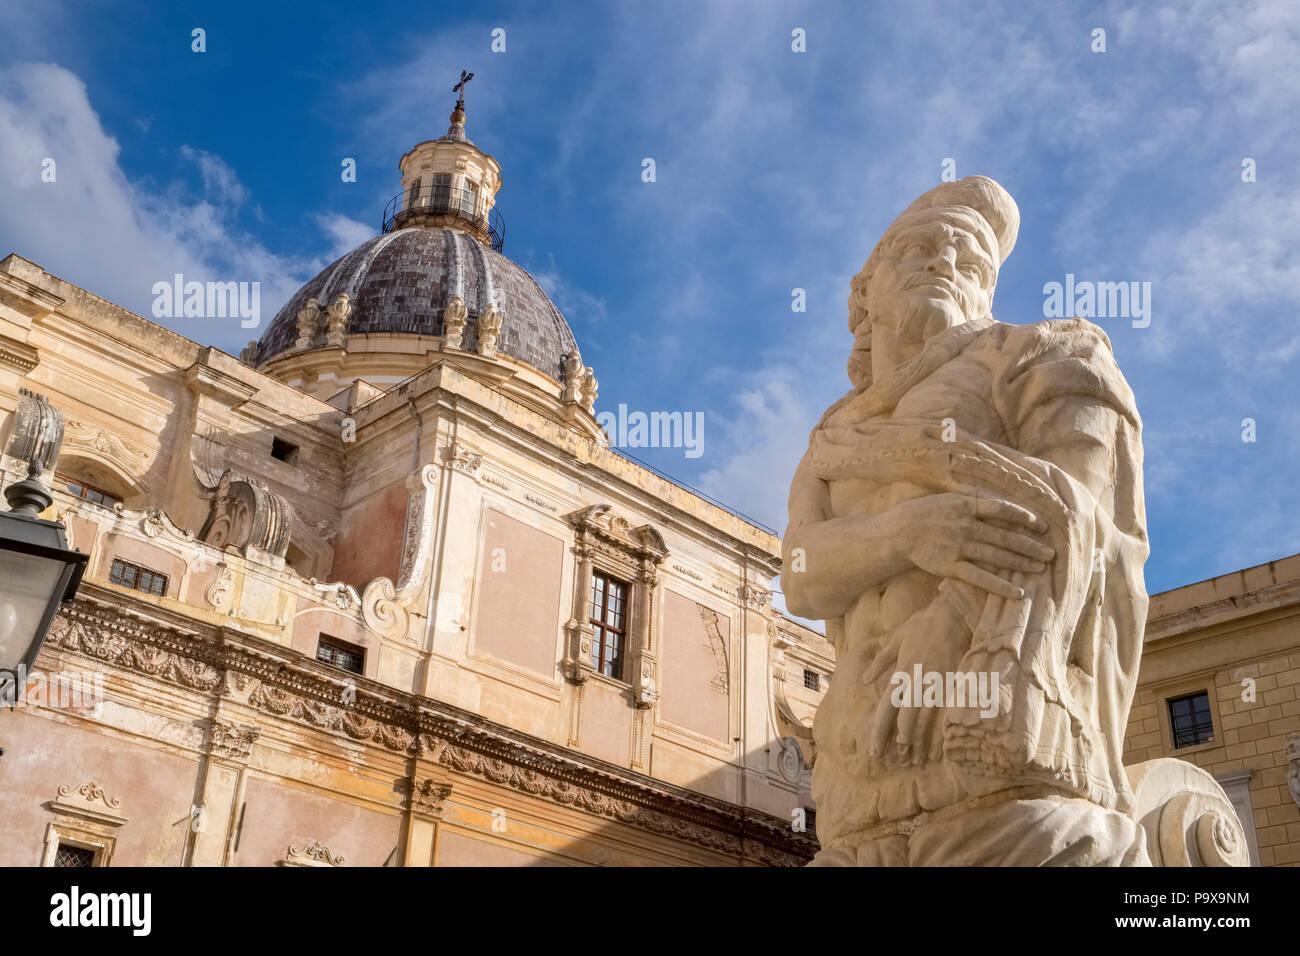 Parte de la Fontana Pretoria, Praetorian Fountain, en Piazza Pretoria en Palermo, Sicilia, Italia, Europa mostrando Santa Caterina dome en el fondo Imagen De Stock